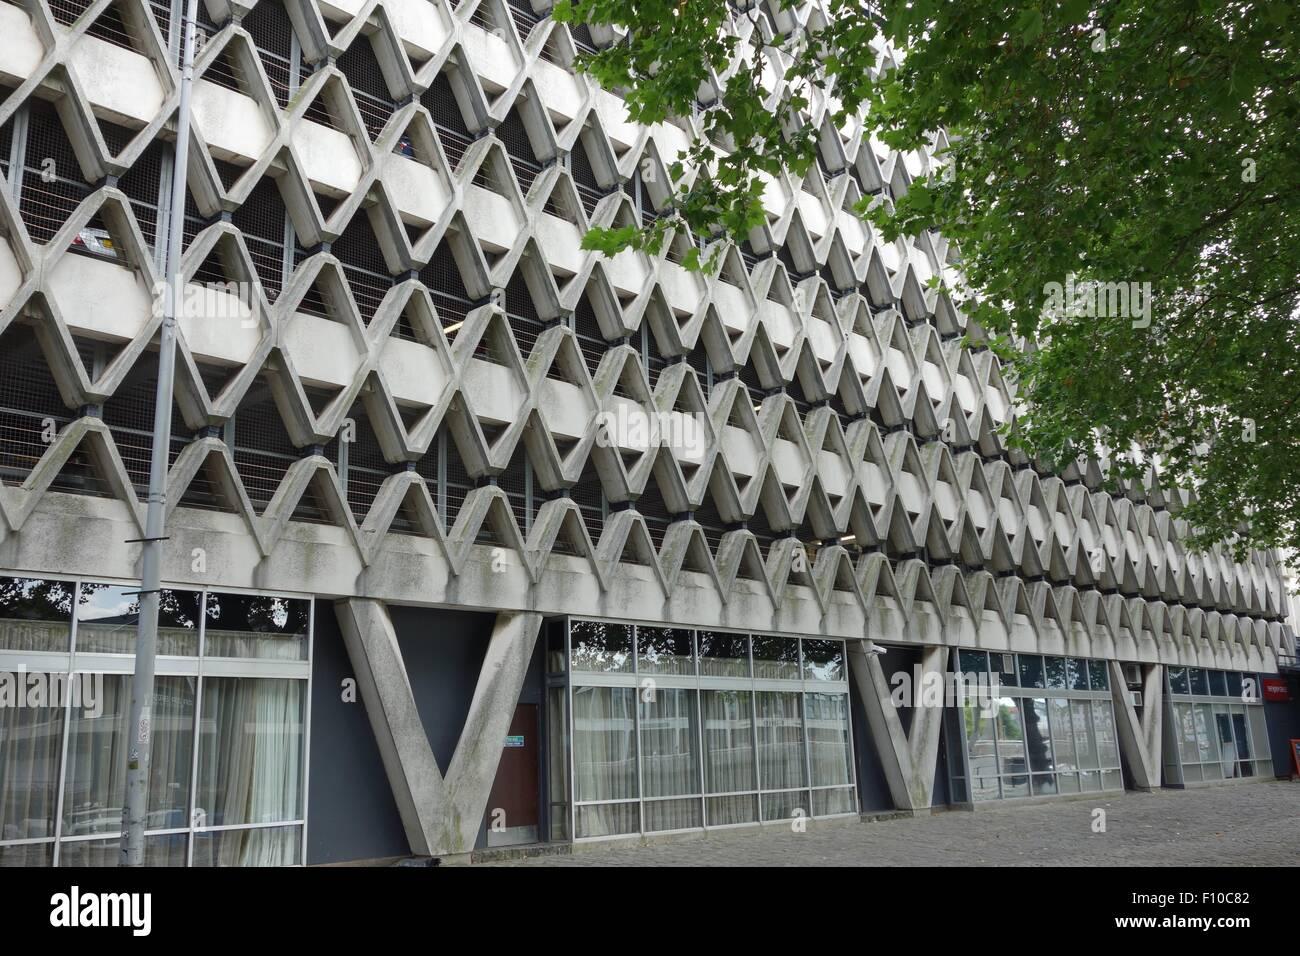 Bristol multistorey car park seen from Narrow Quay side, 1966 honeycomb concrete Brutalist - Stock Image